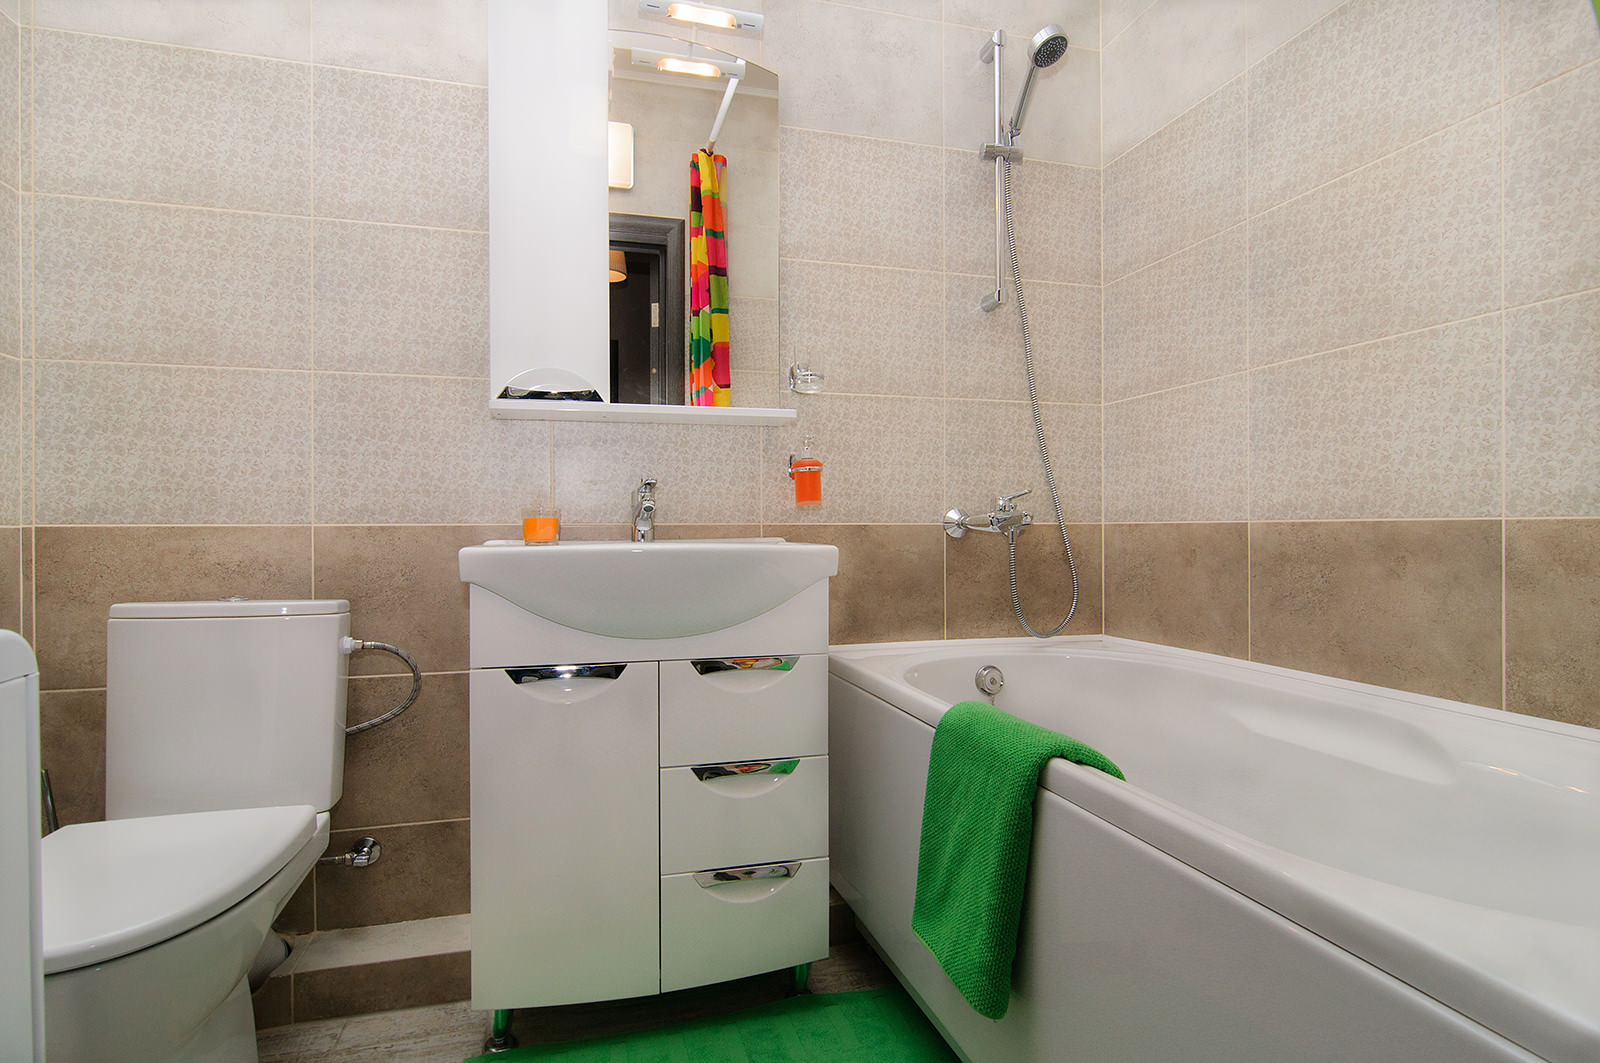 ednostaen-apartament-s-moderen-i-uiuten-interior-42-m-5g